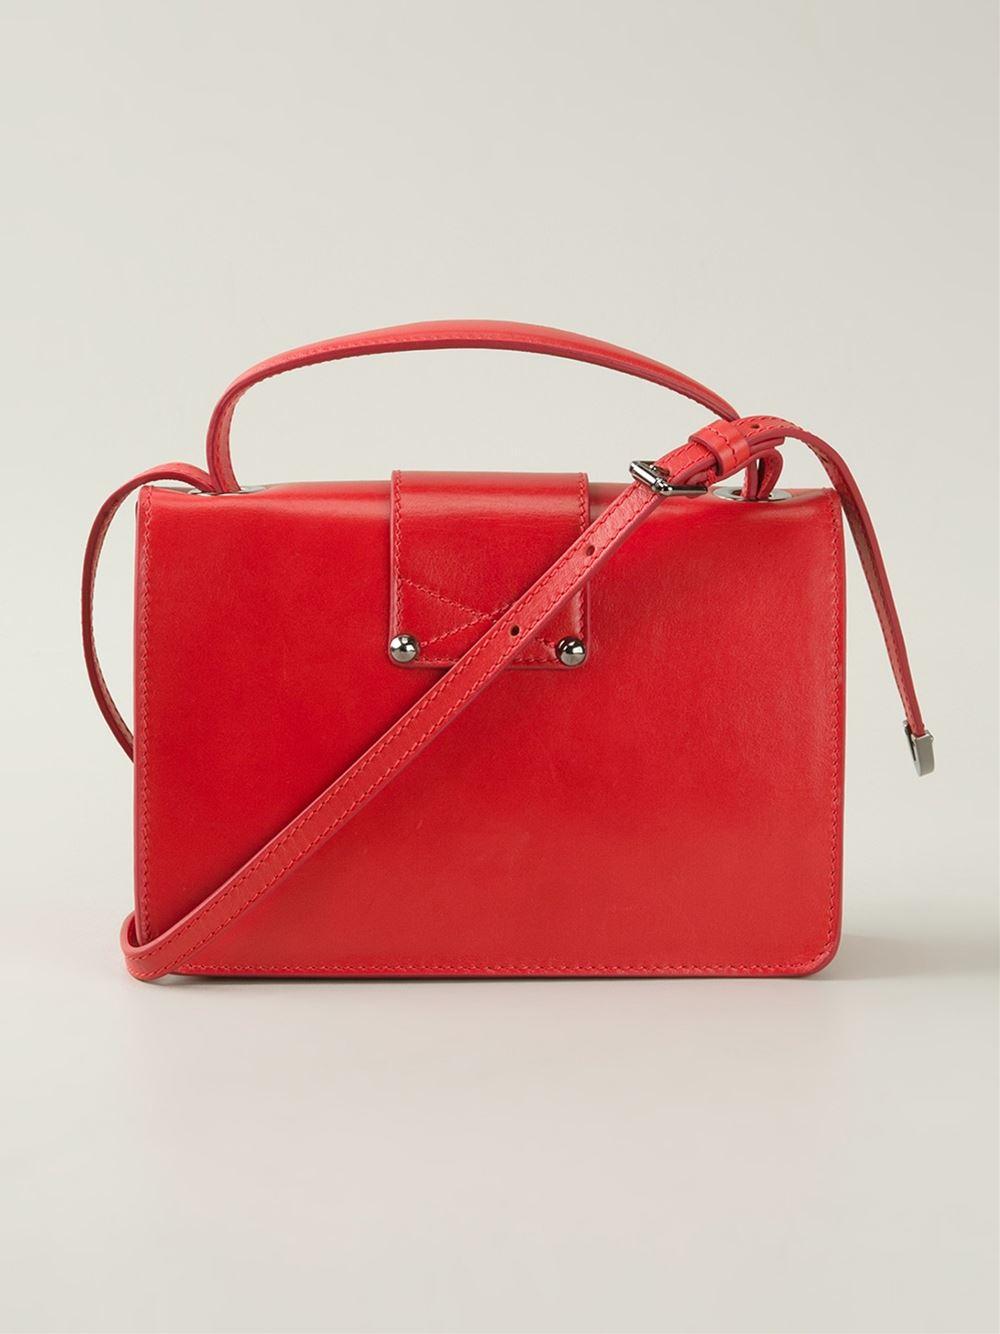 Rebel/XB crossbody bag - Red Jimmy Choo London NmgOIZd4s9